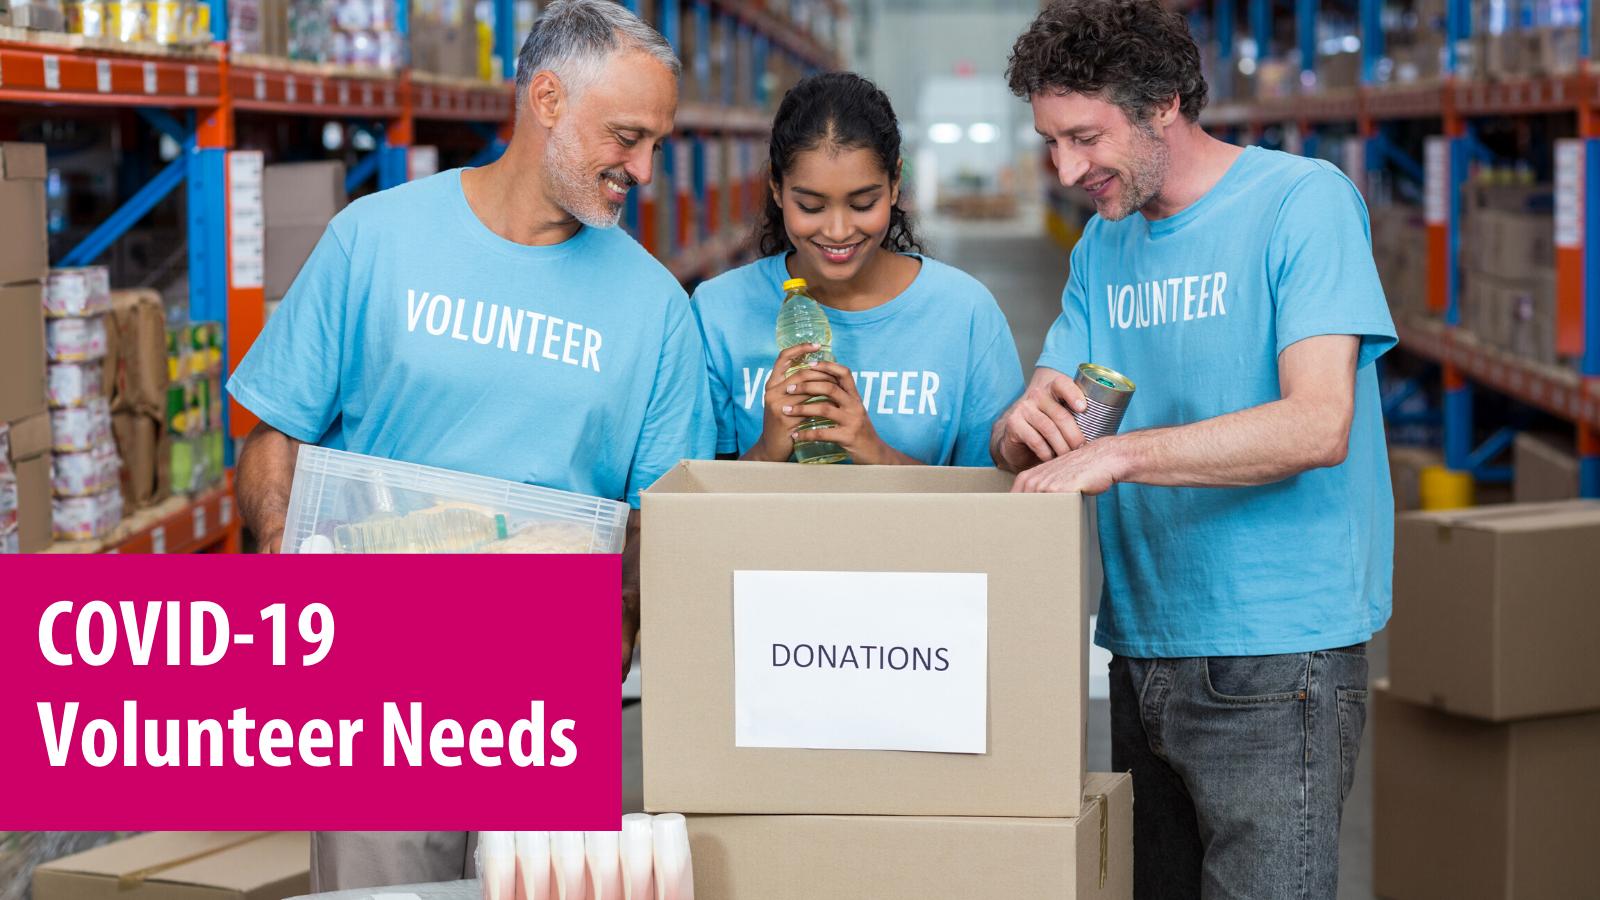 COVID-19 Volunteer Needs